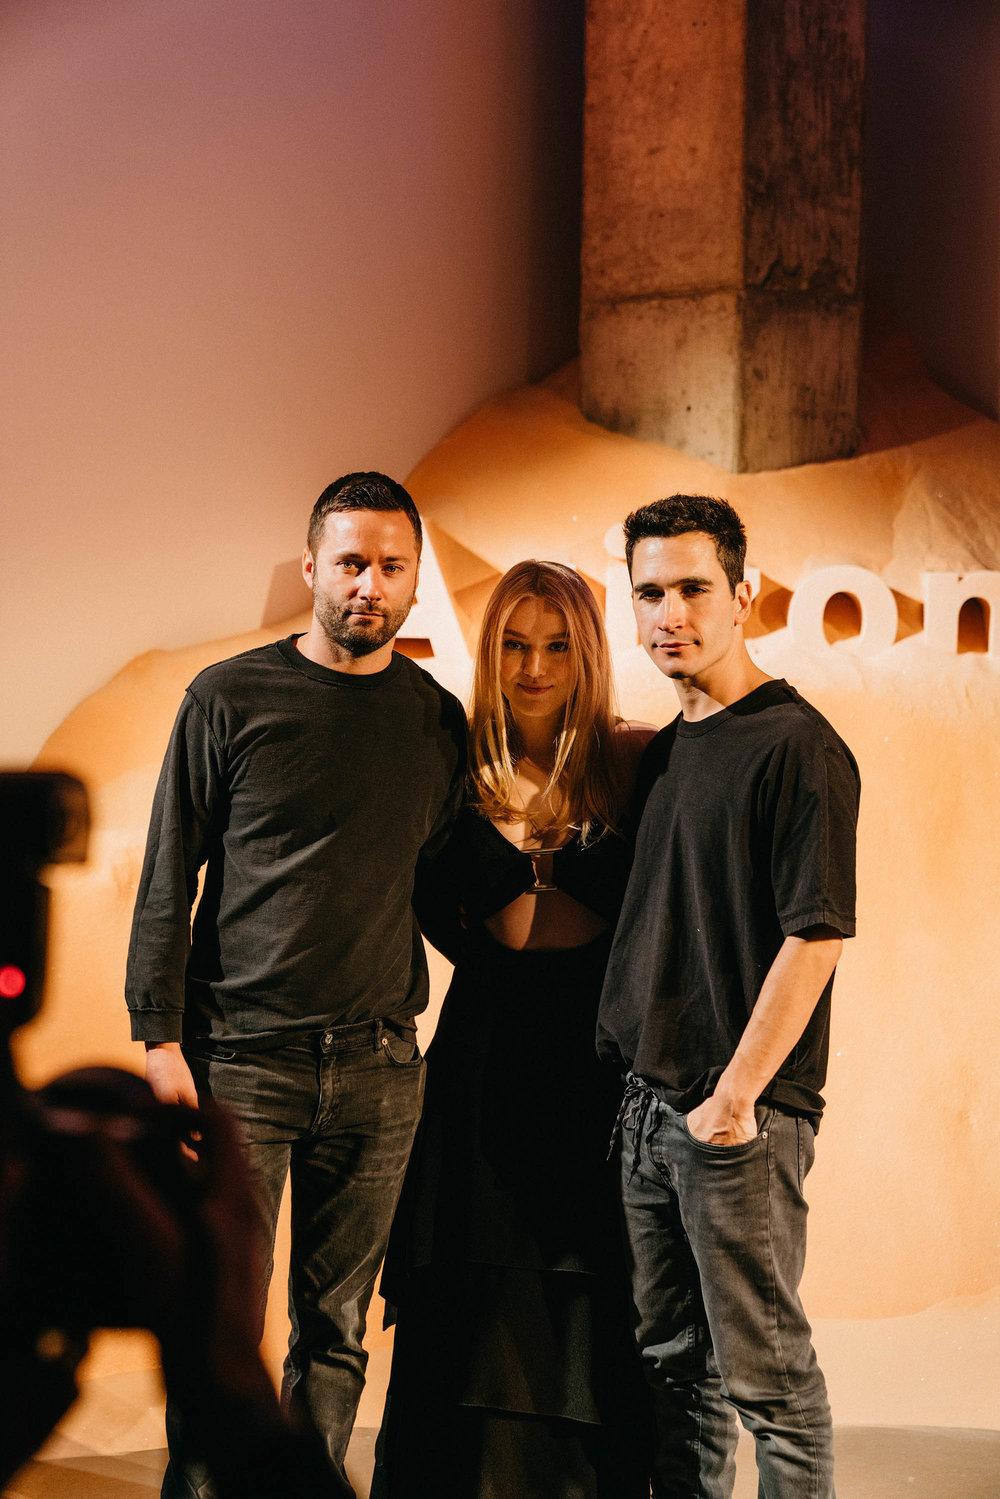 Proenza Schouler designers Jack McCollough and Lazaro Hernandez, Dakota Fanning